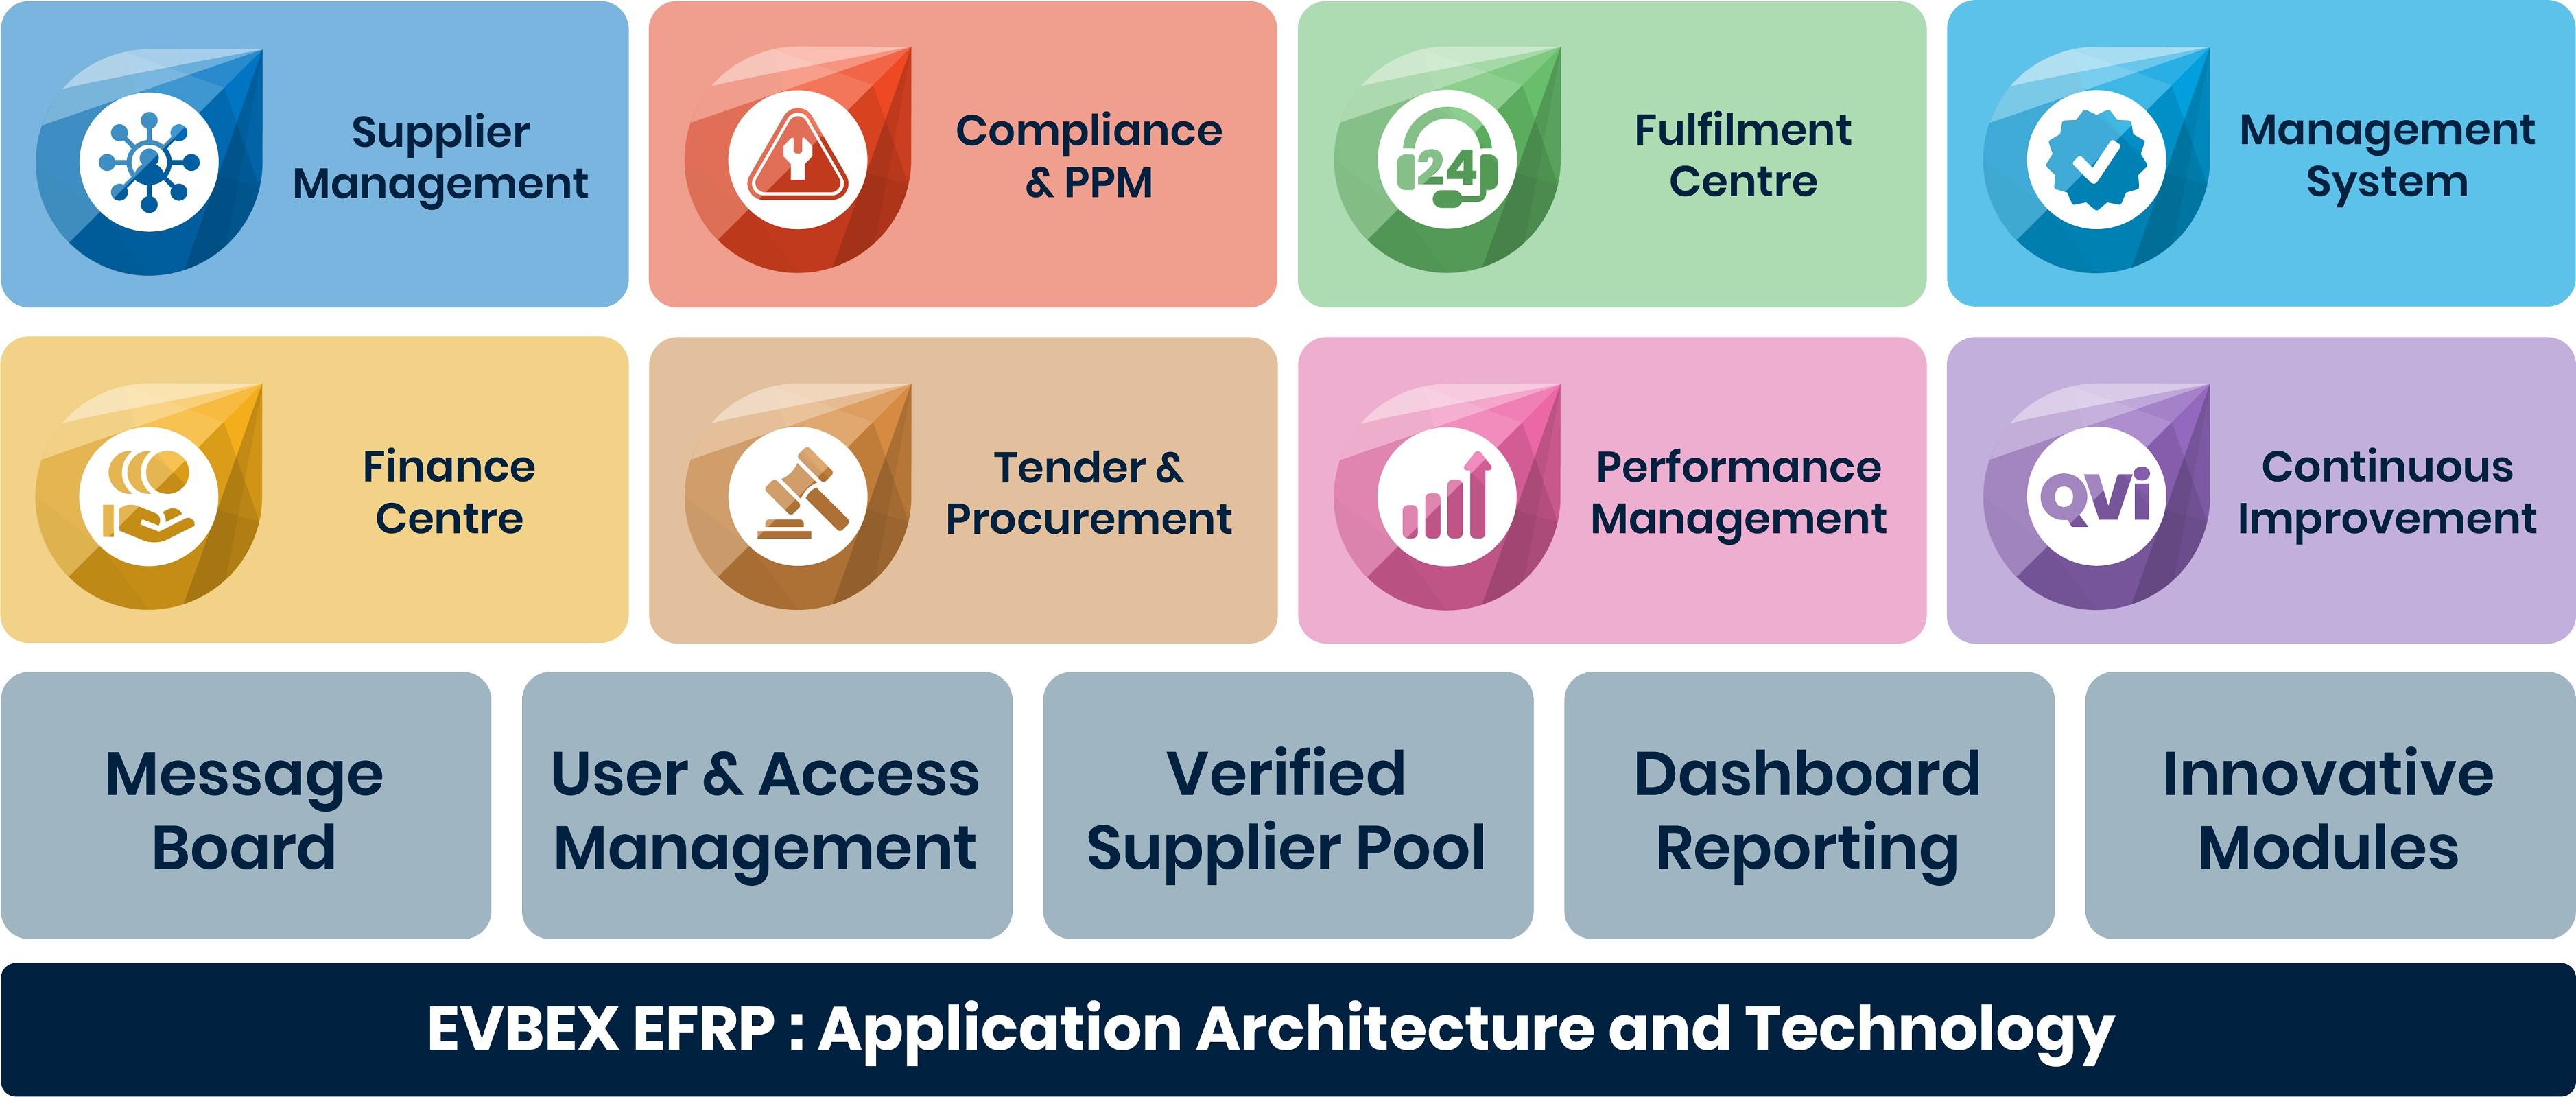 FM Navigate-Facilities Management Software - Integrated Archirtecture